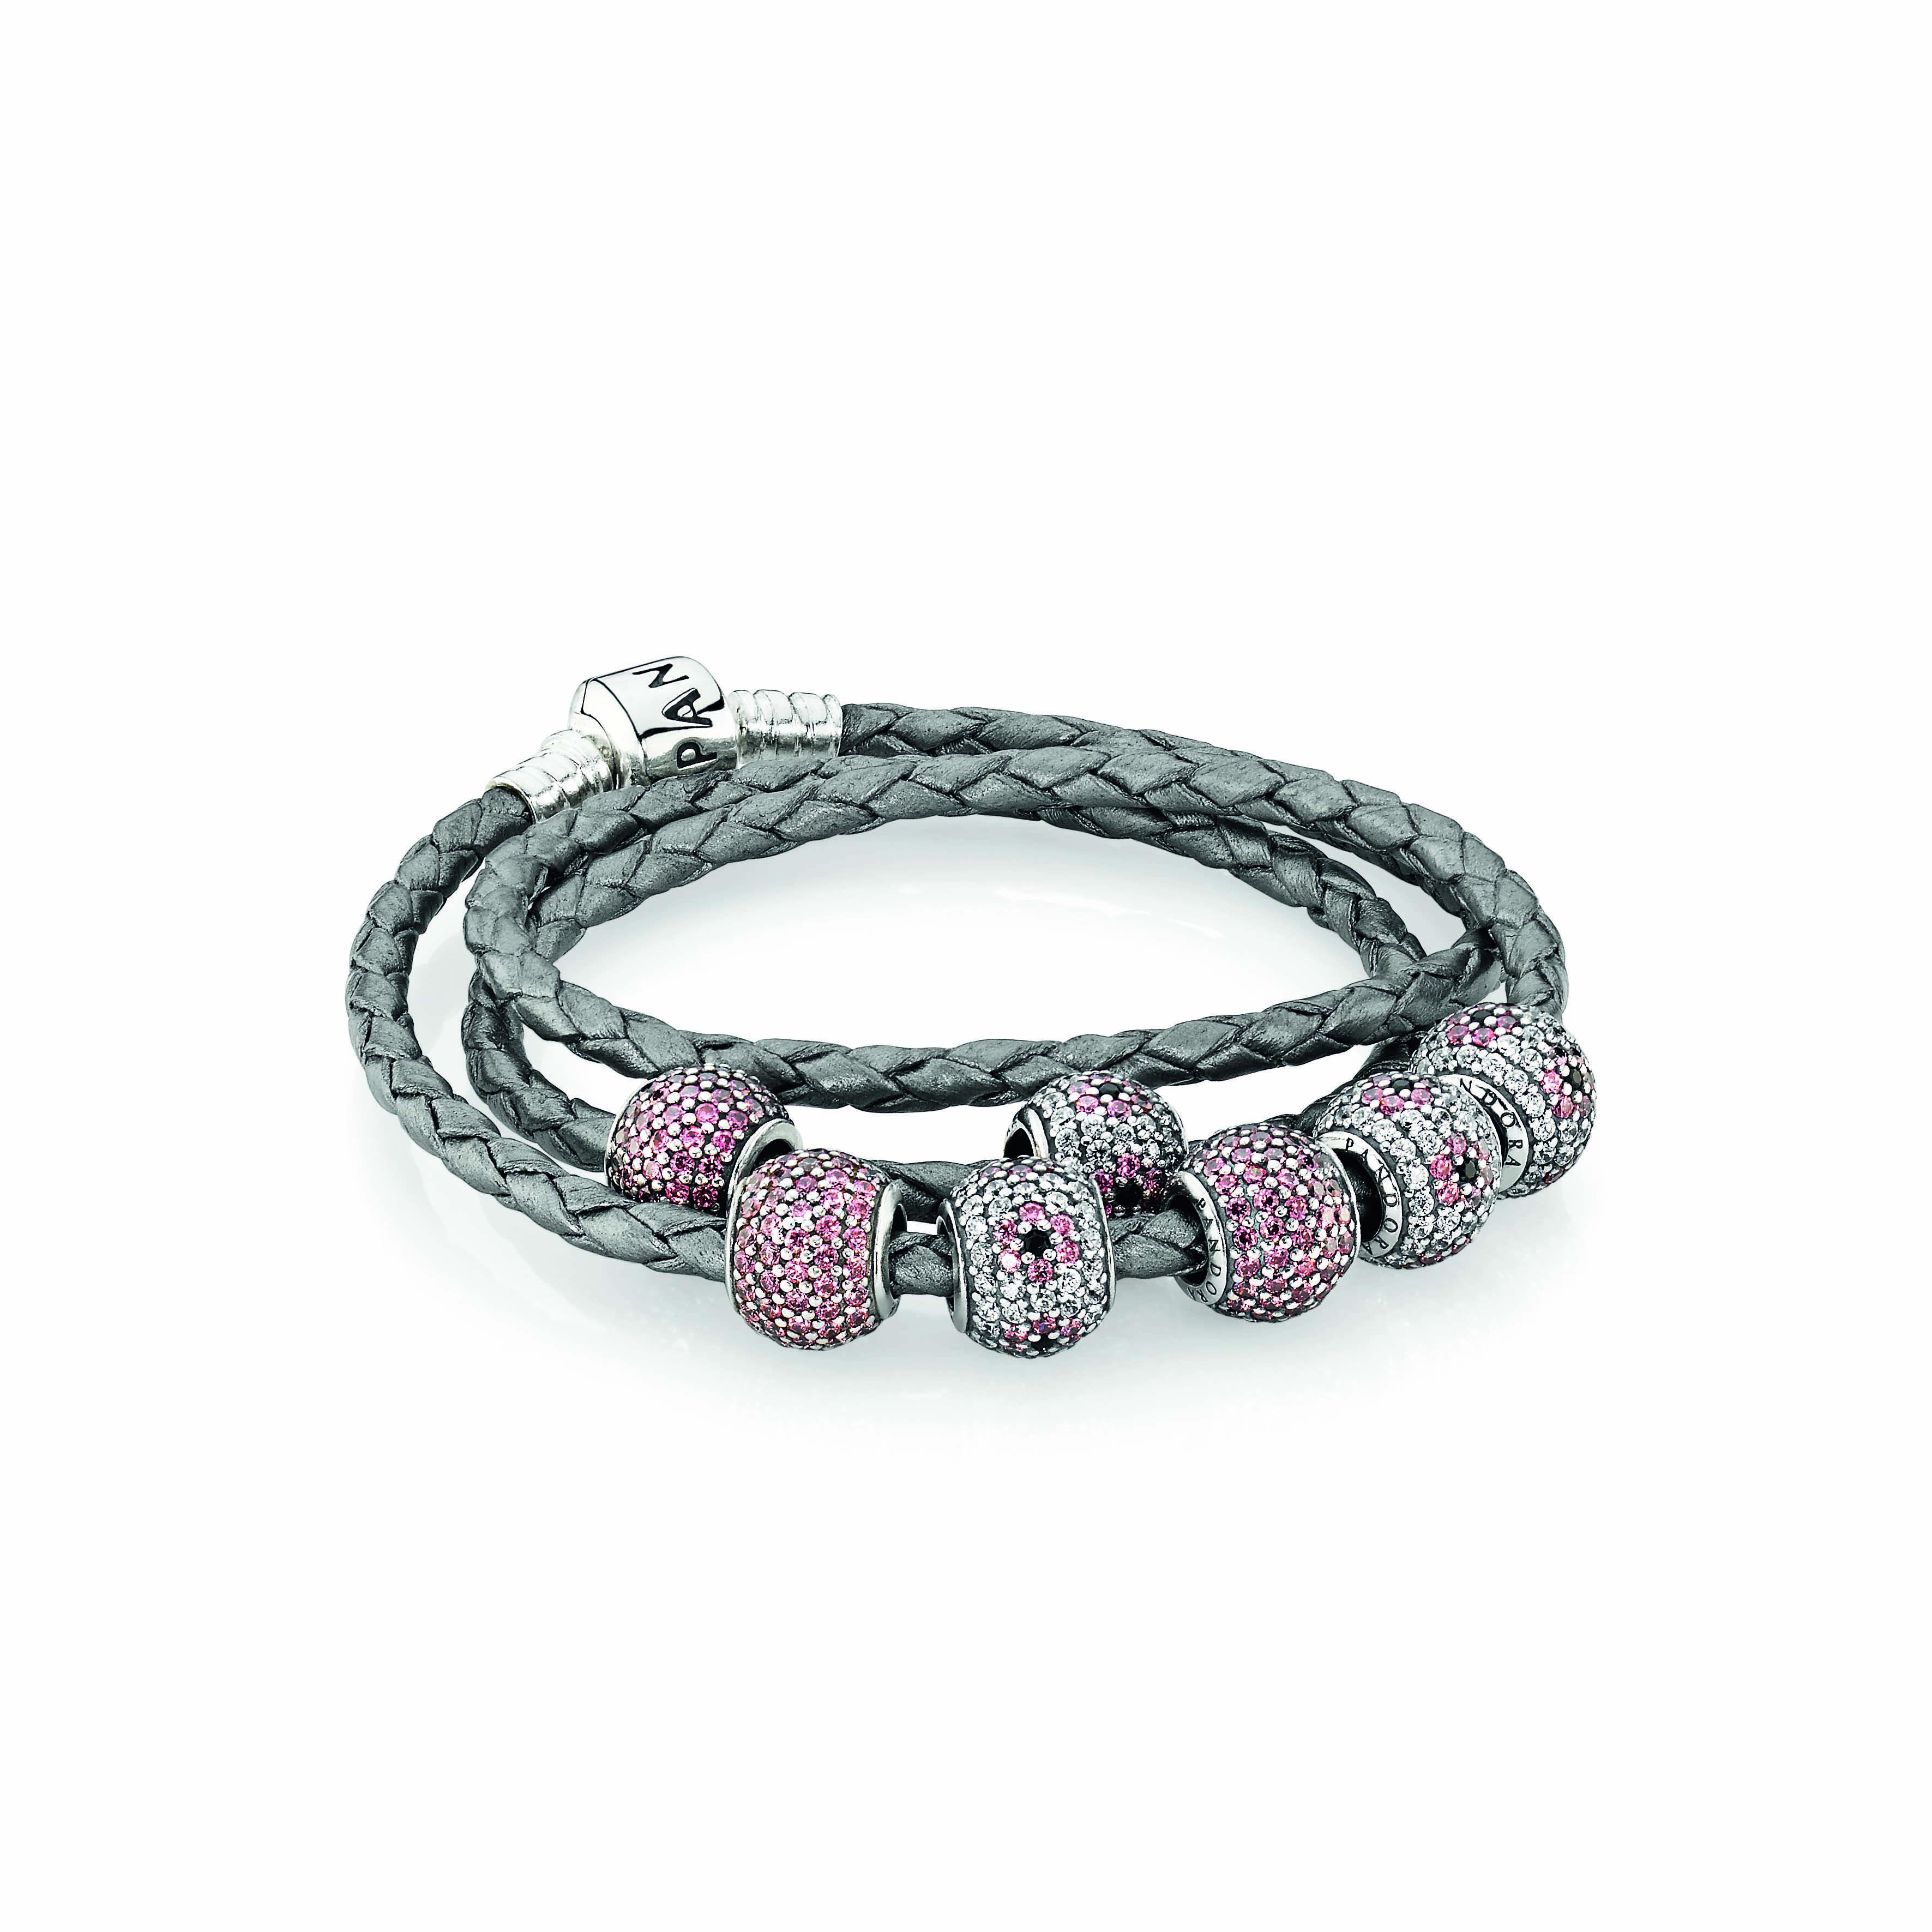 Pandora Triple Leather Bracelet 79 And Pavé Charms 69 Each D8eaf A2e08